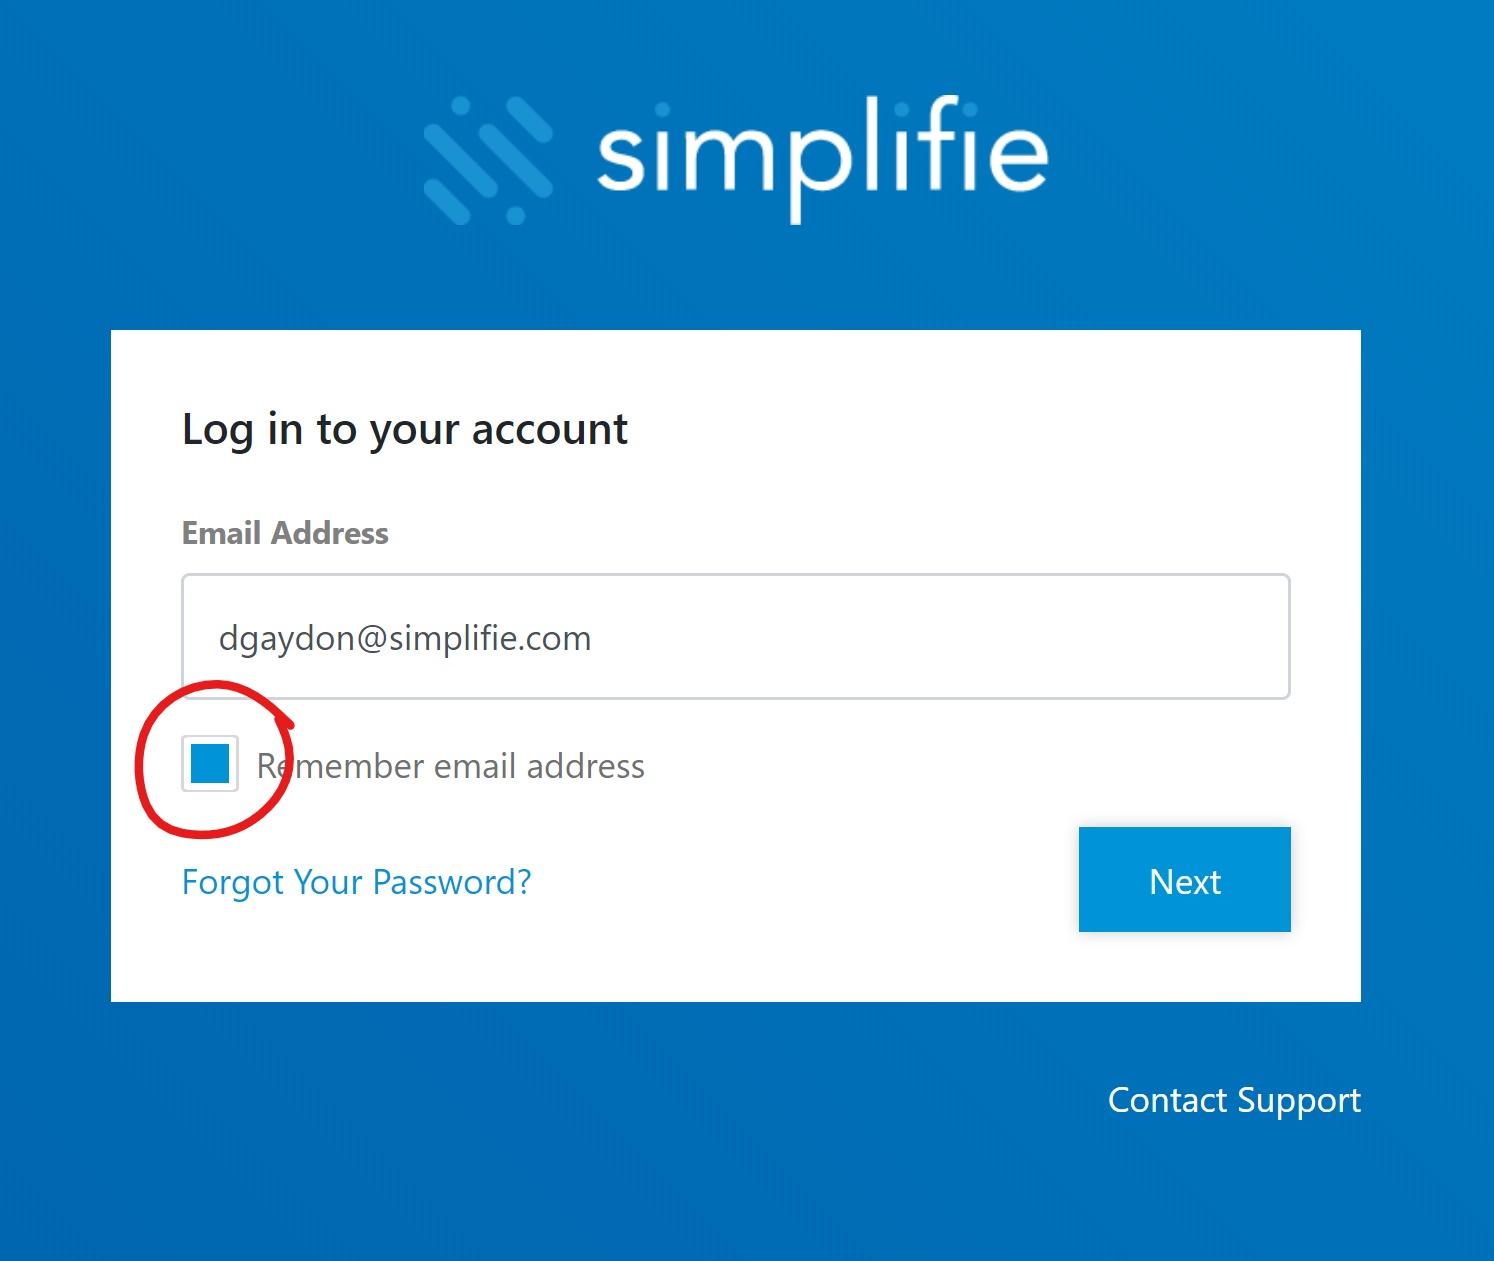 Remember_email.jpg